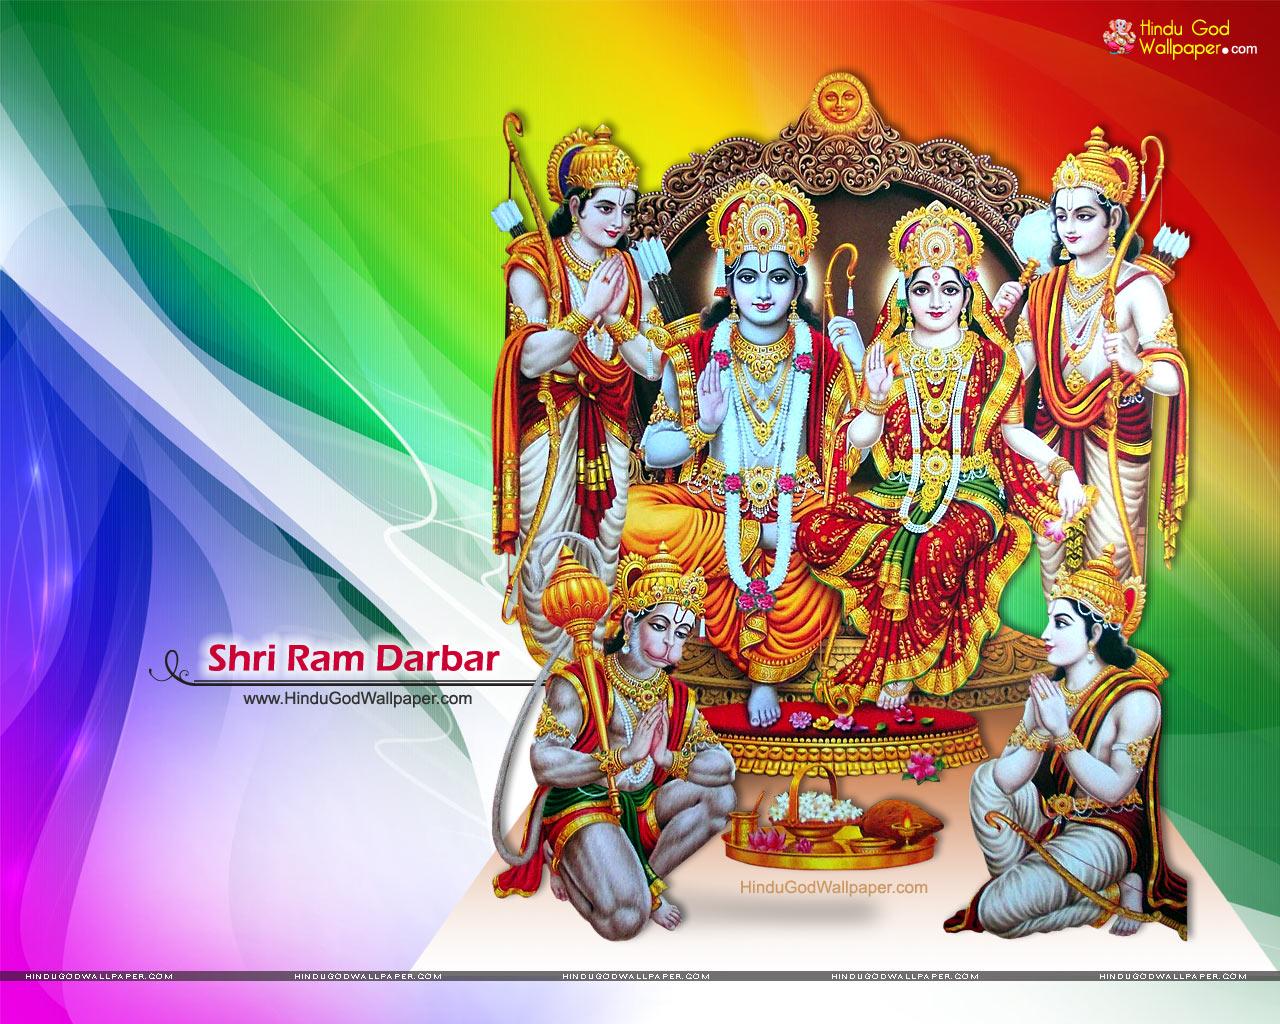 ram darbar wallpapers images amp pics free download